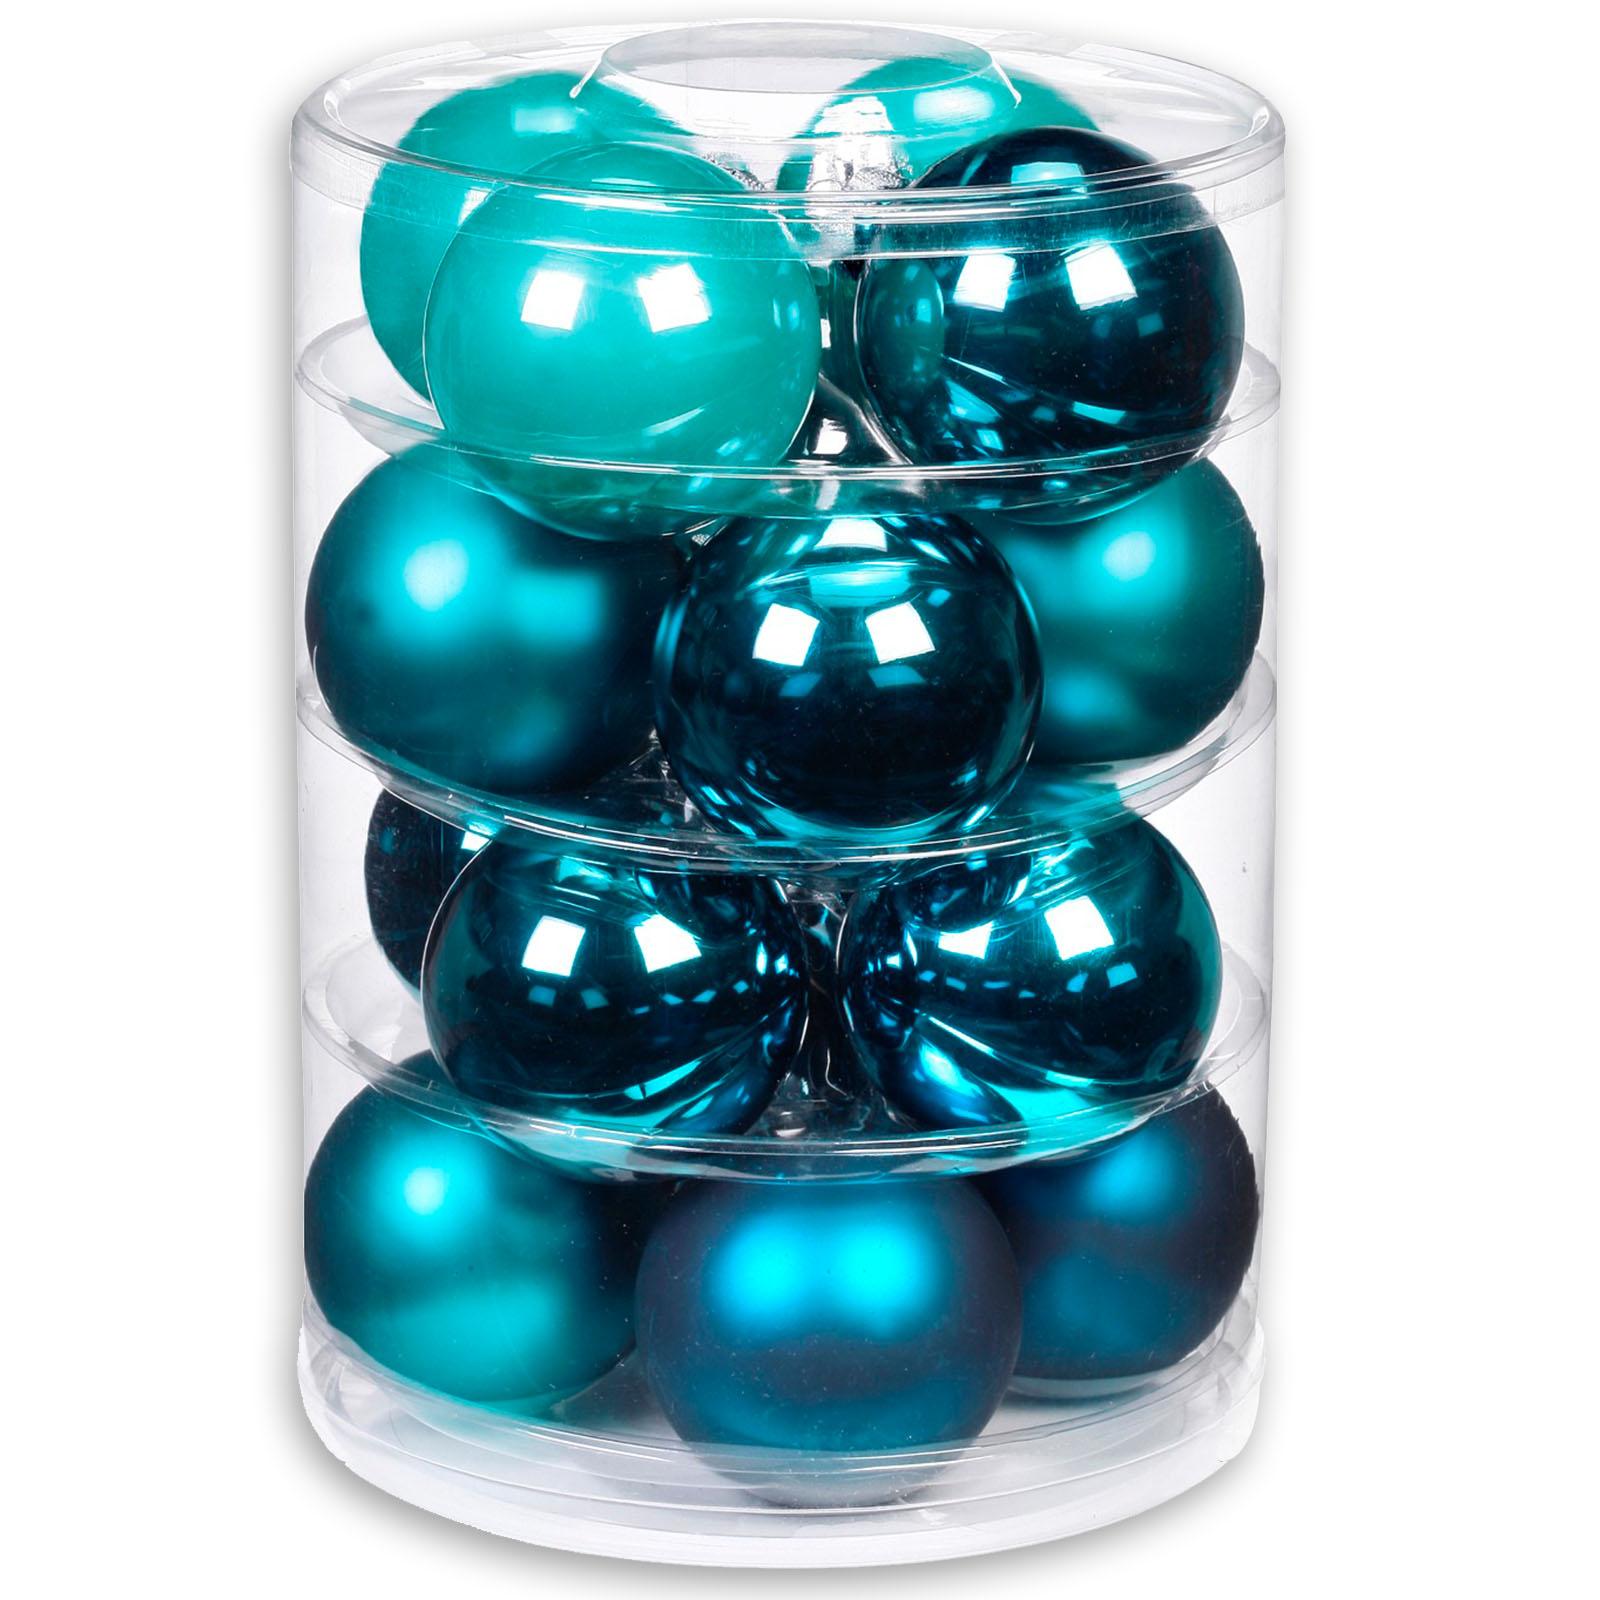 Material Christbaumkugeln.Christbaumkugeln Turkis Petrol Glas 16 Stuck 7 5 Cm